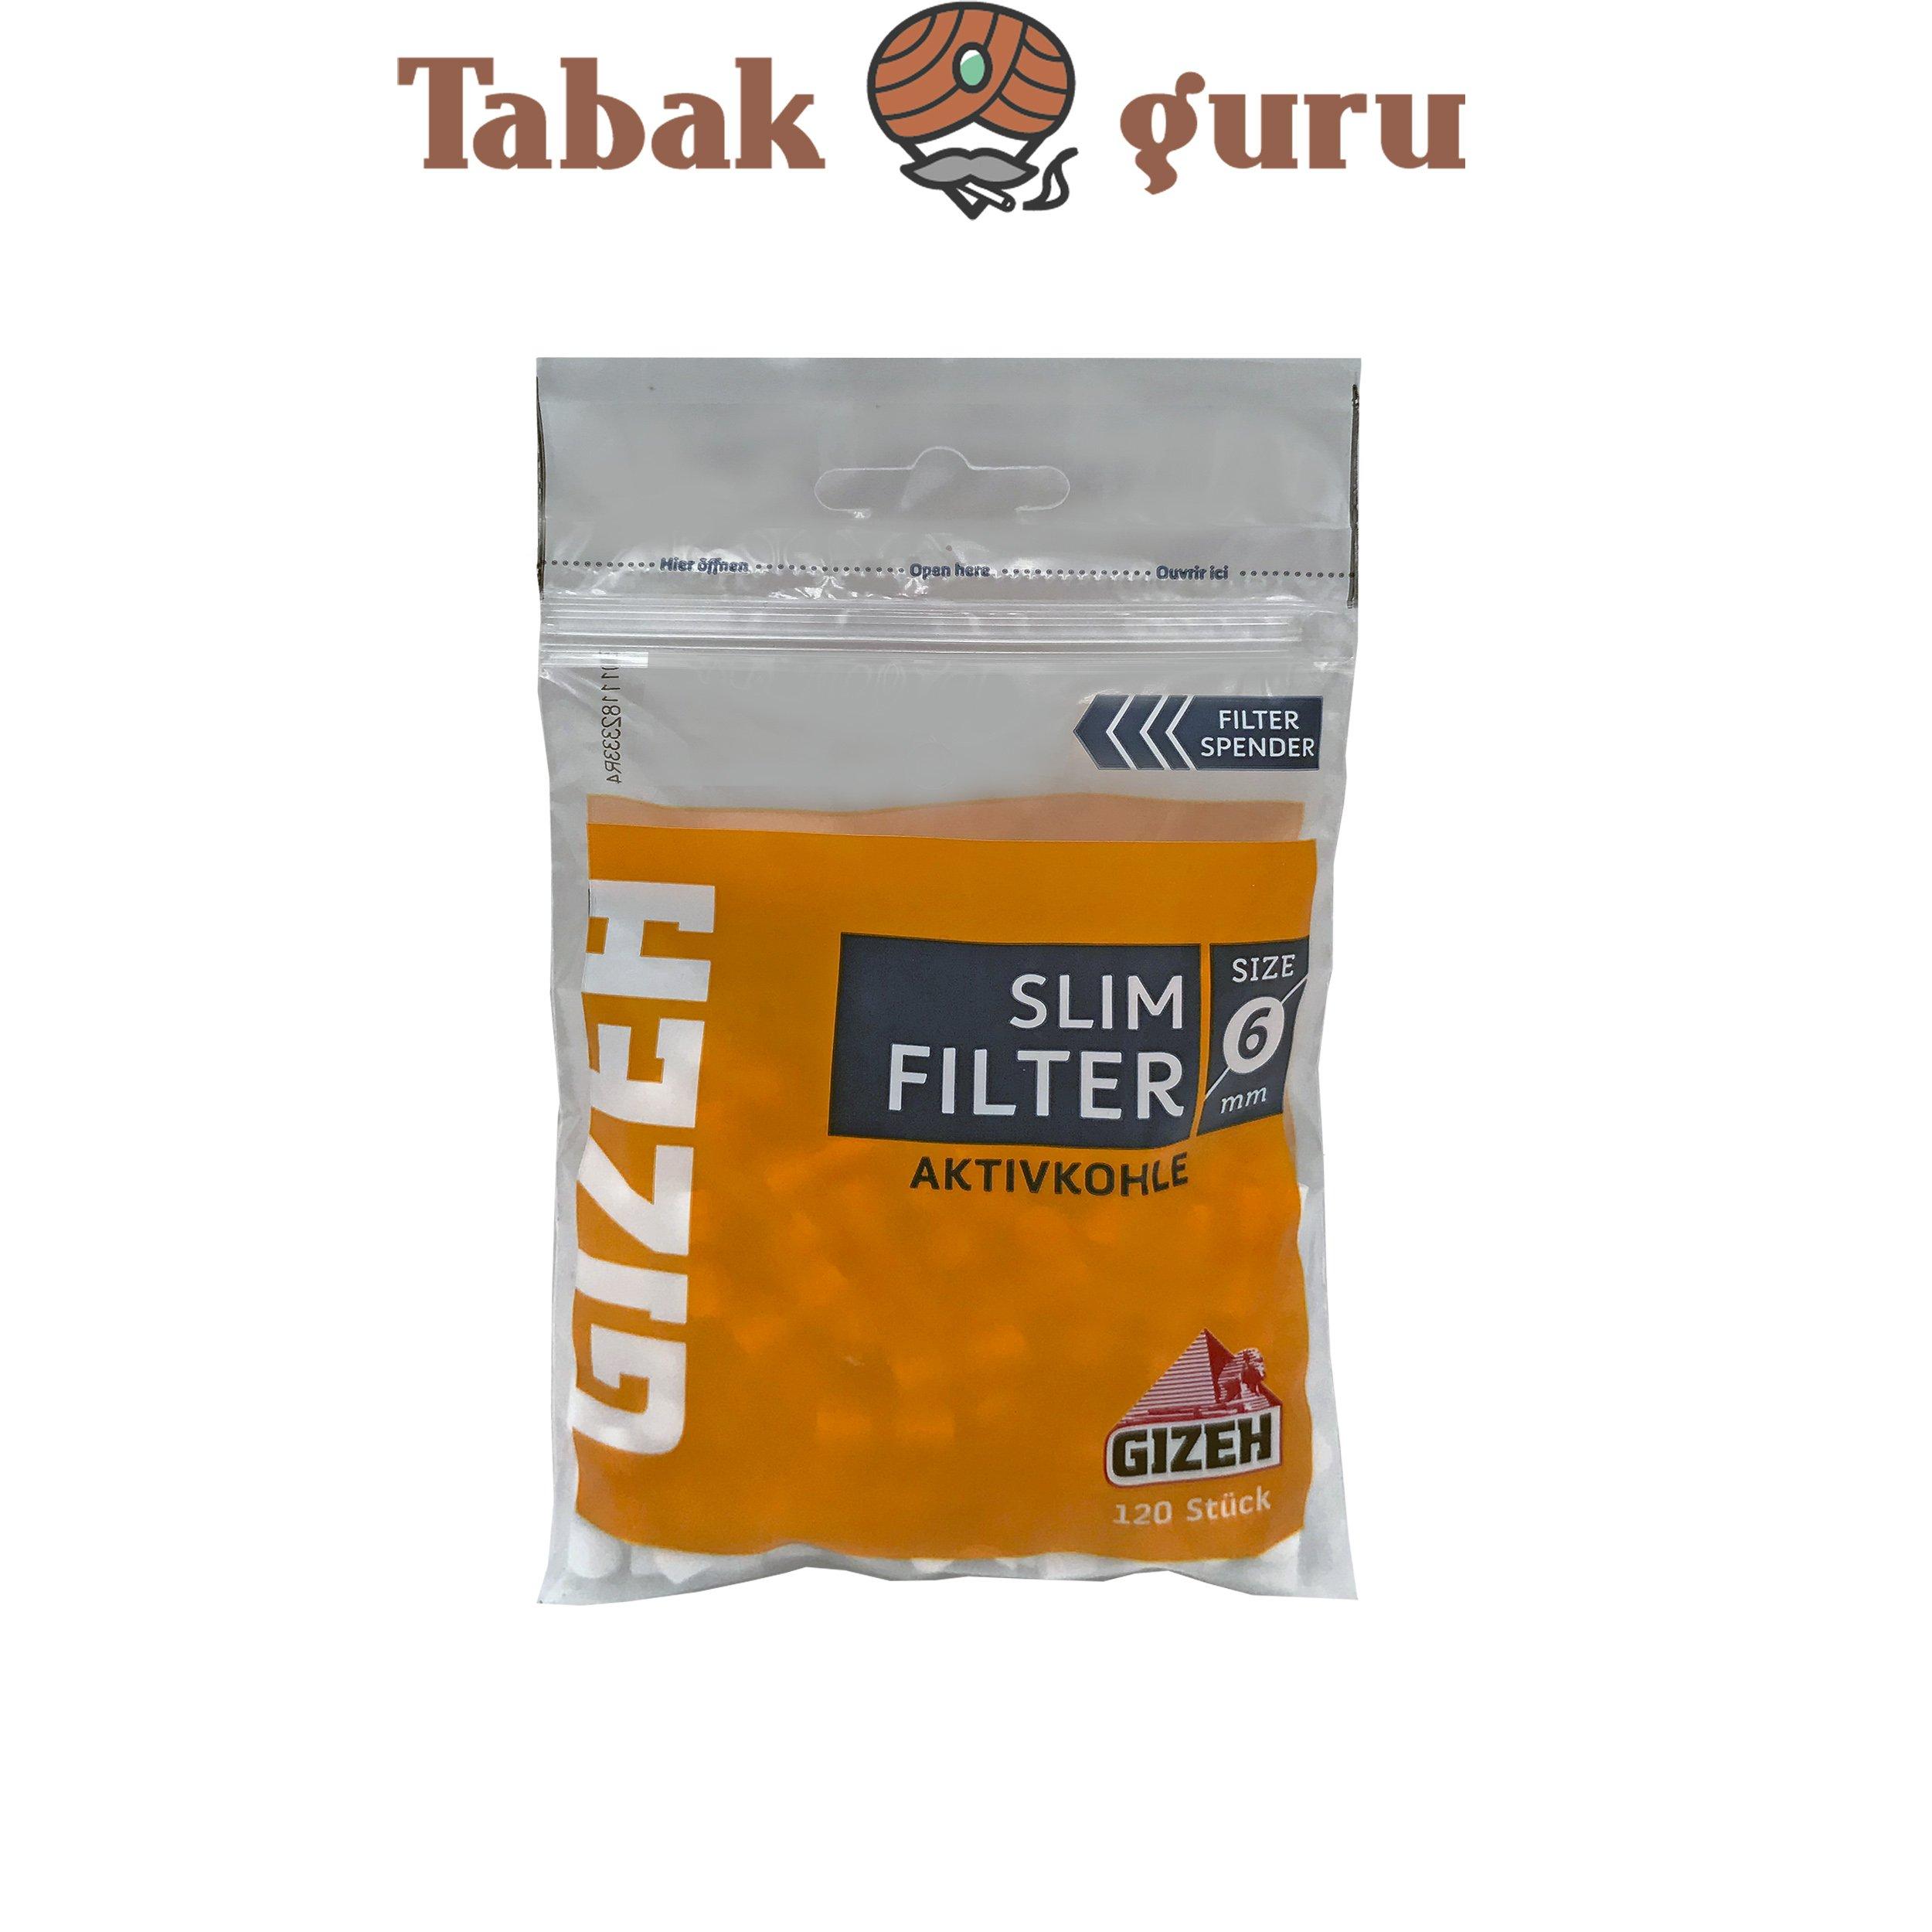 Gizeh Slim Filter 1 Päckchen a 120 Aktivkohle Filter